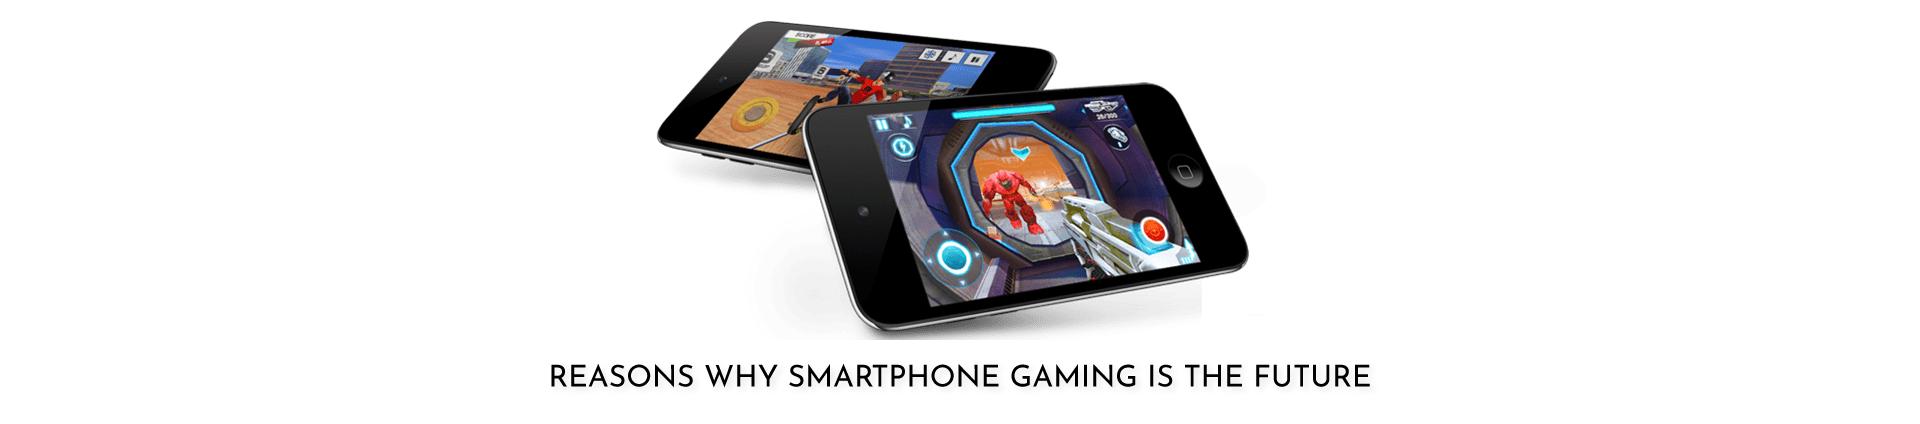 Future of Smartphone Gaming